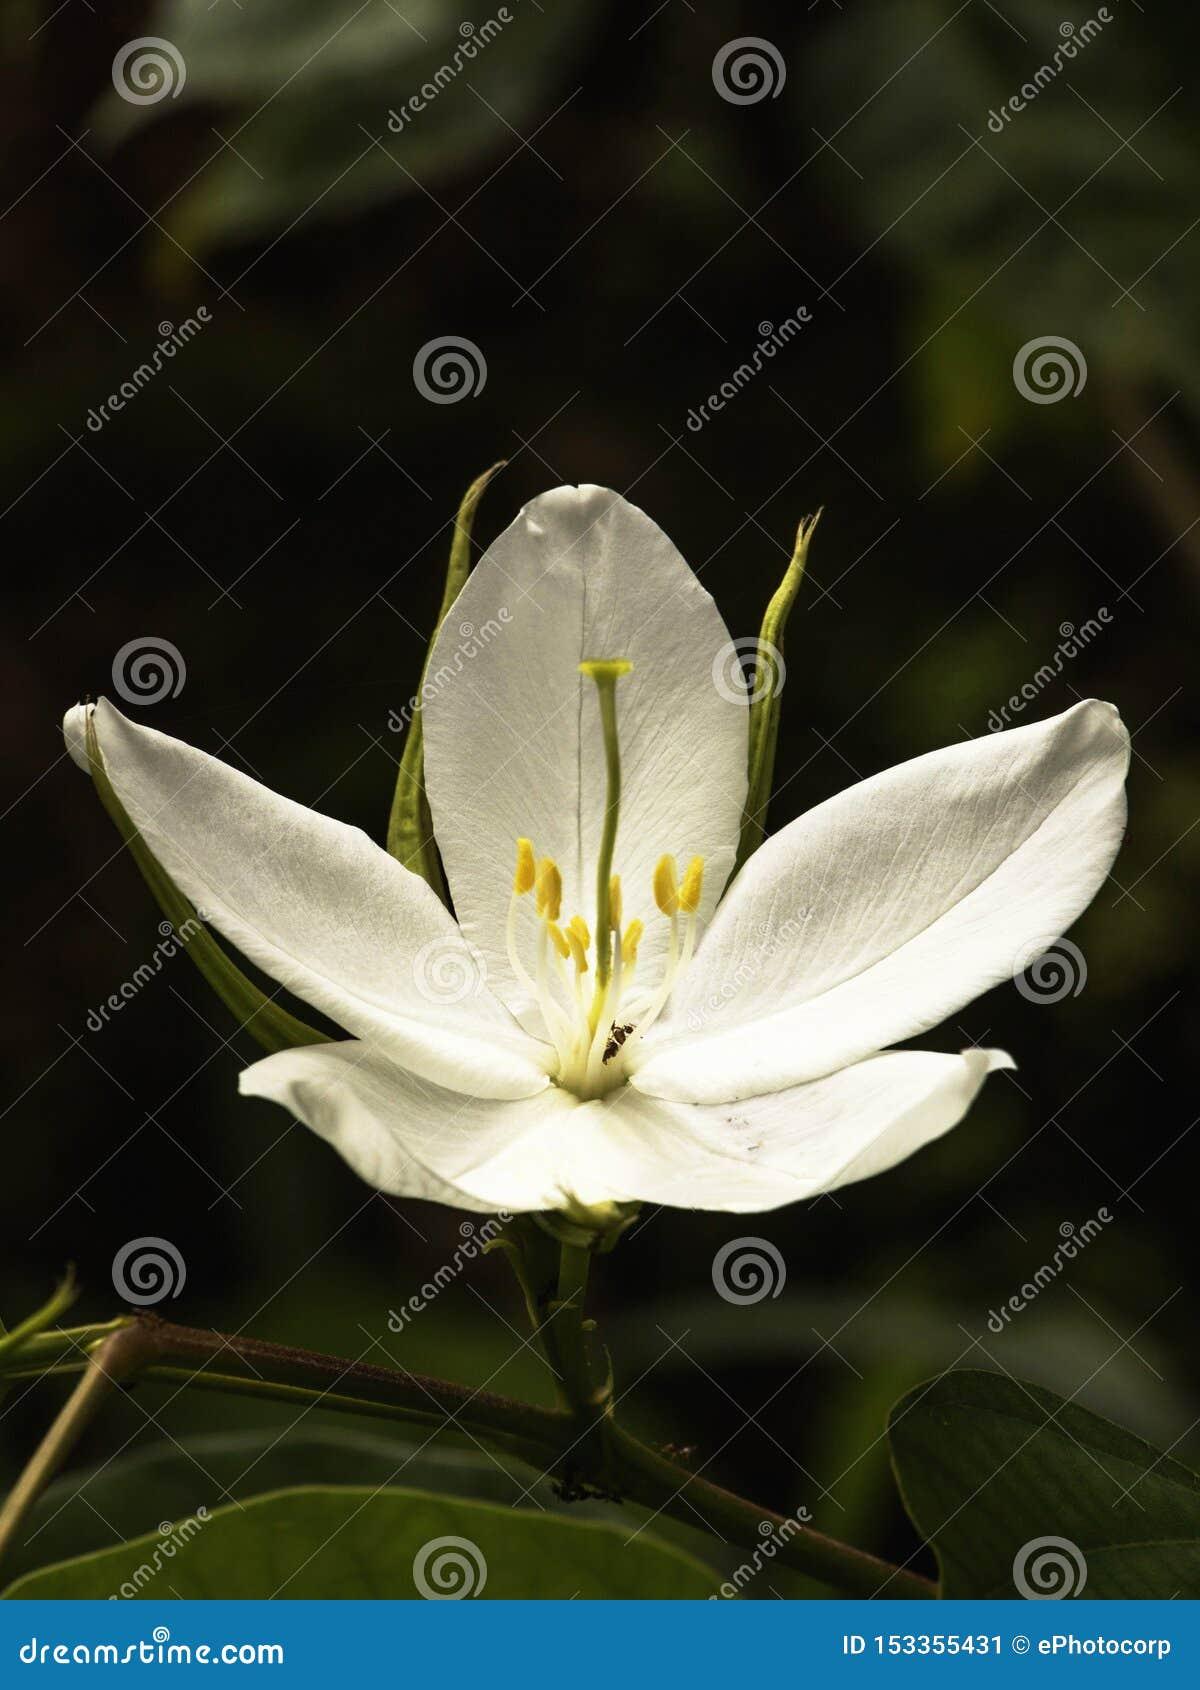 Bauhinia Racemosa Or Bidi Leaf Tree Is A Rare Medicinal